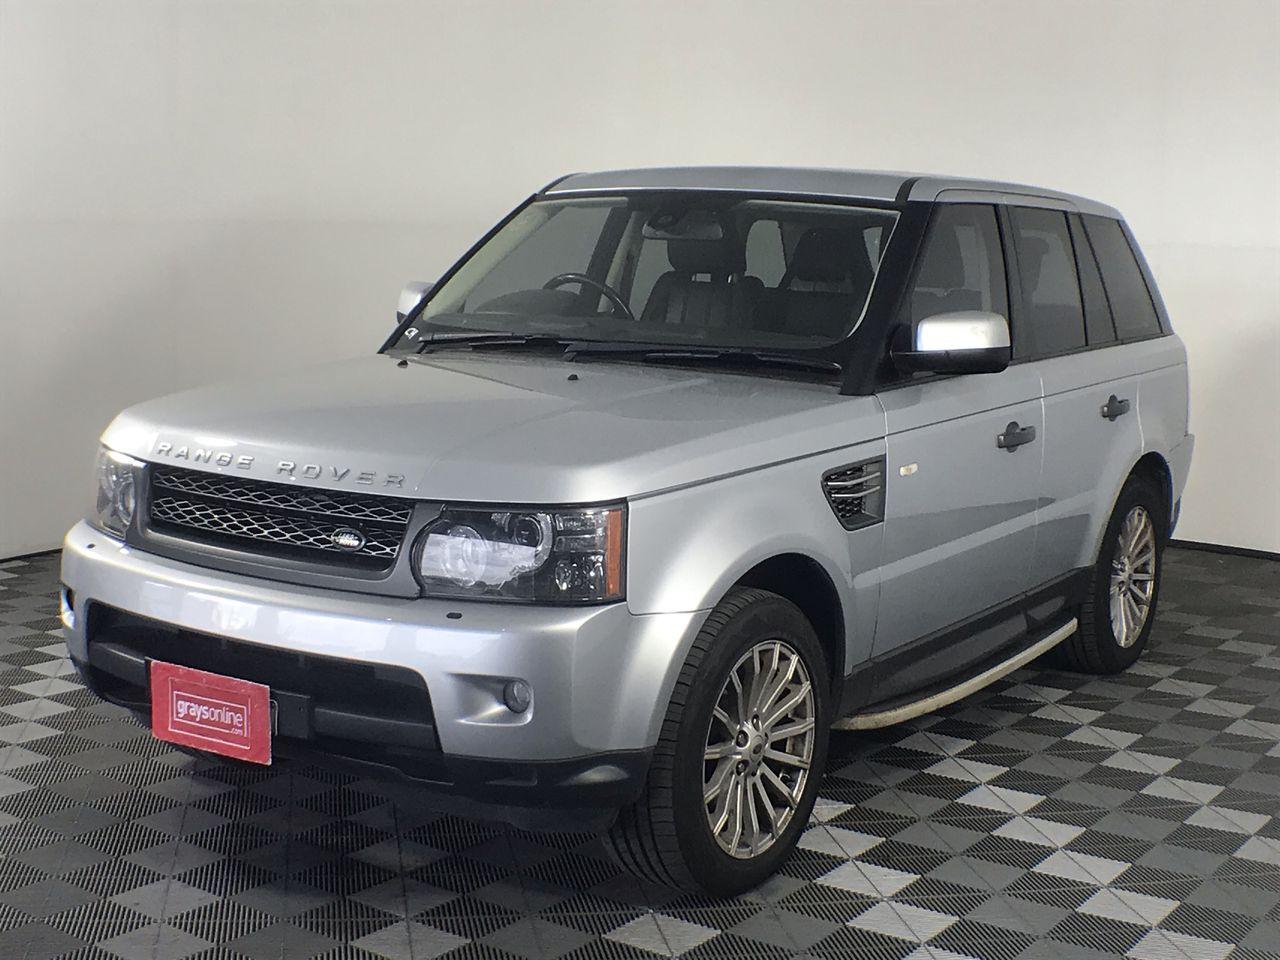 2011 Land Rover Range Rover Sport 3.0 TDV6 Turbo Diesel Automatic Wagon